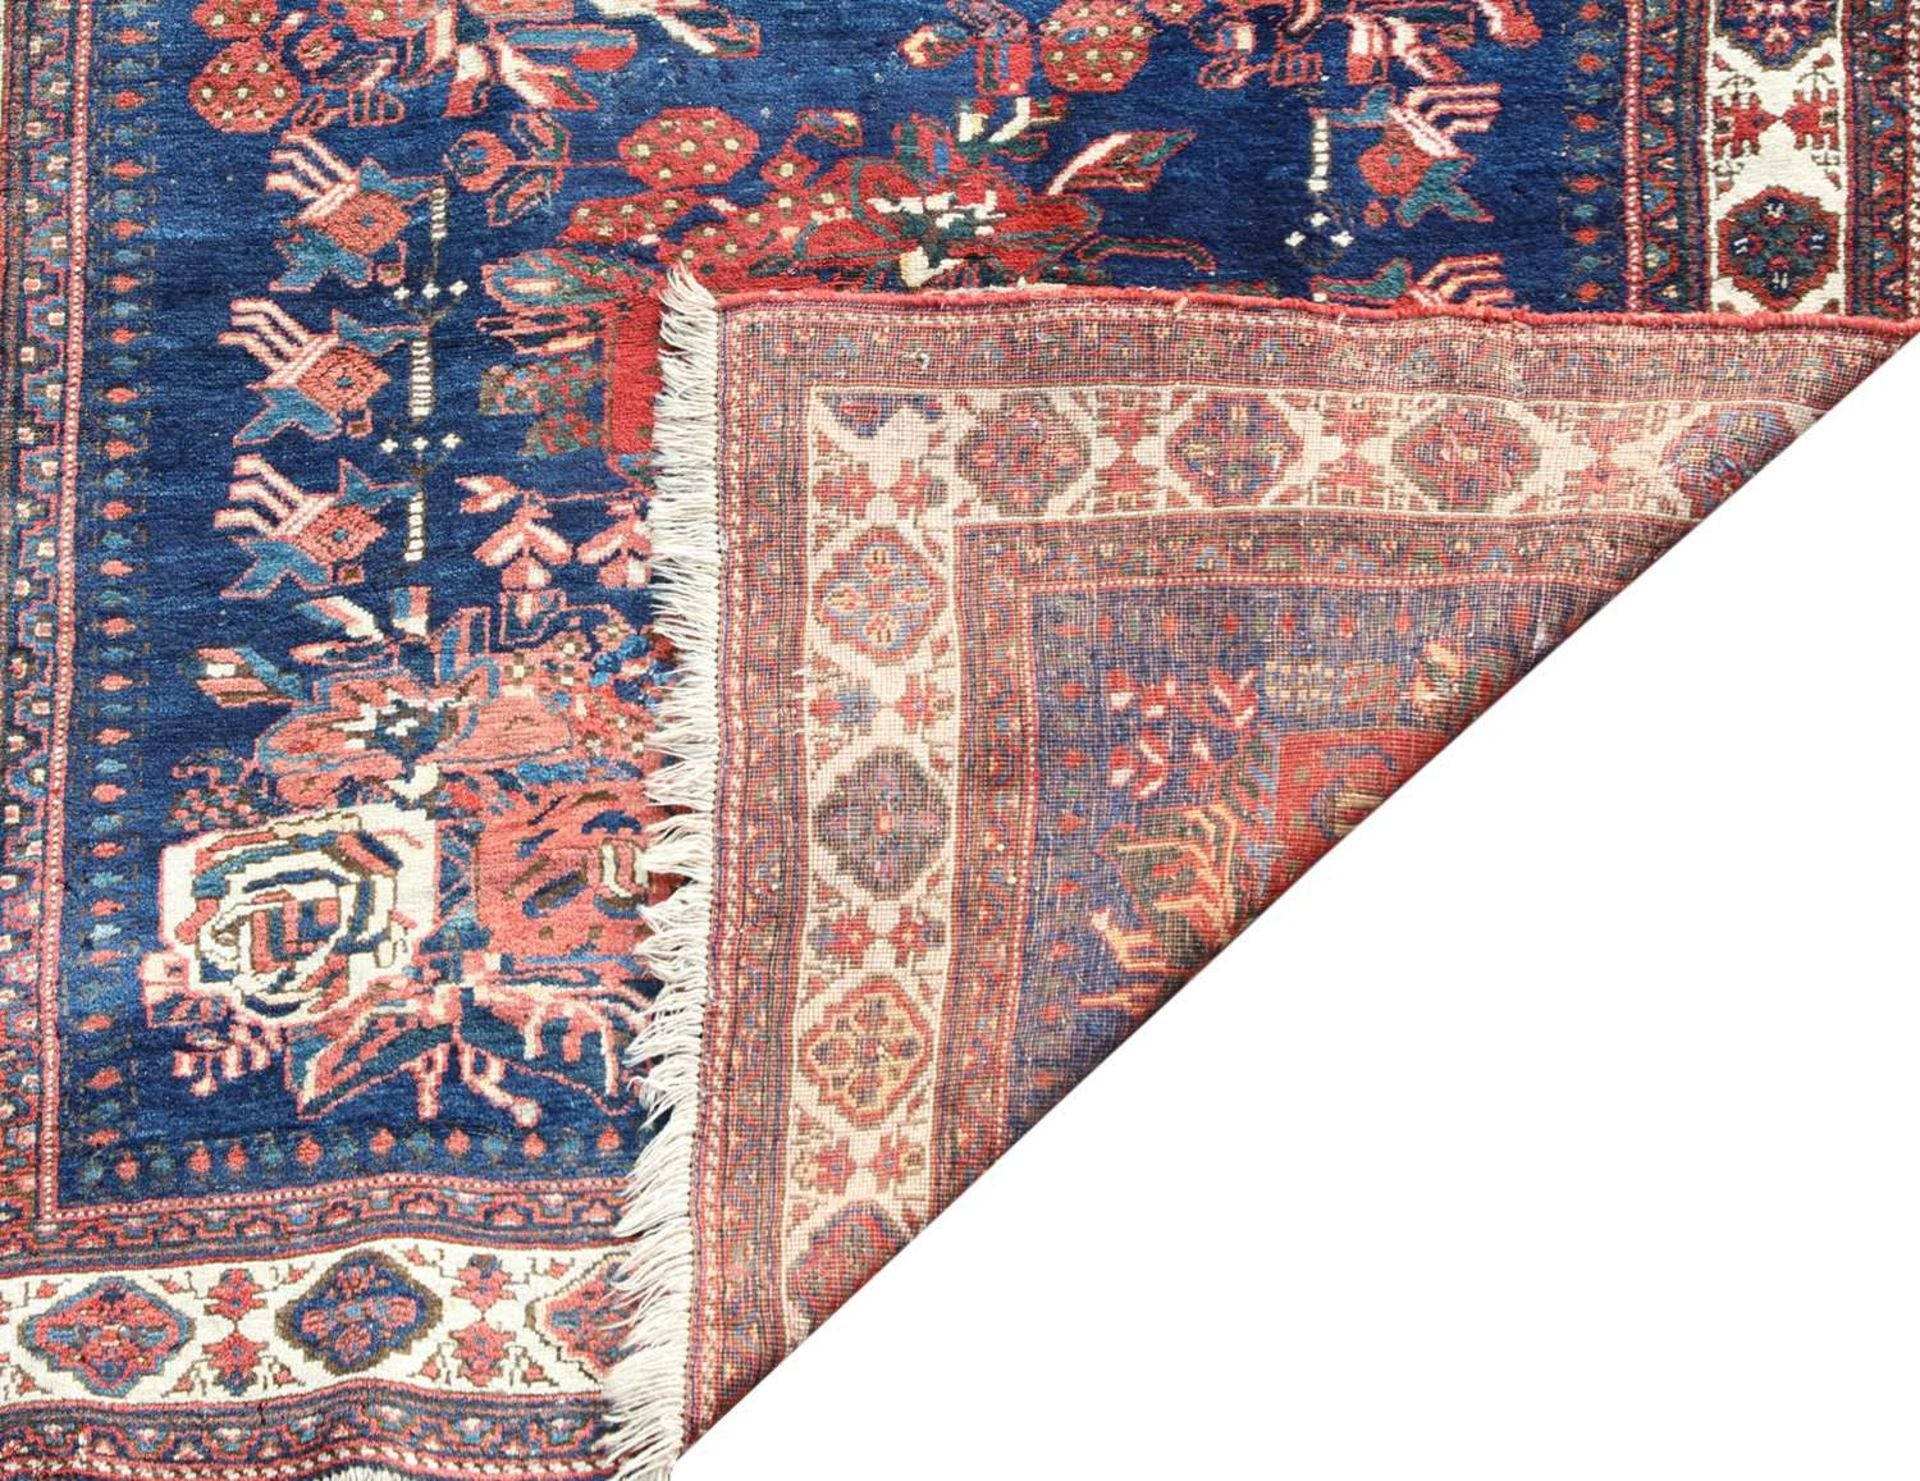 An Afghan Beshir rug, - Image 4 of 4